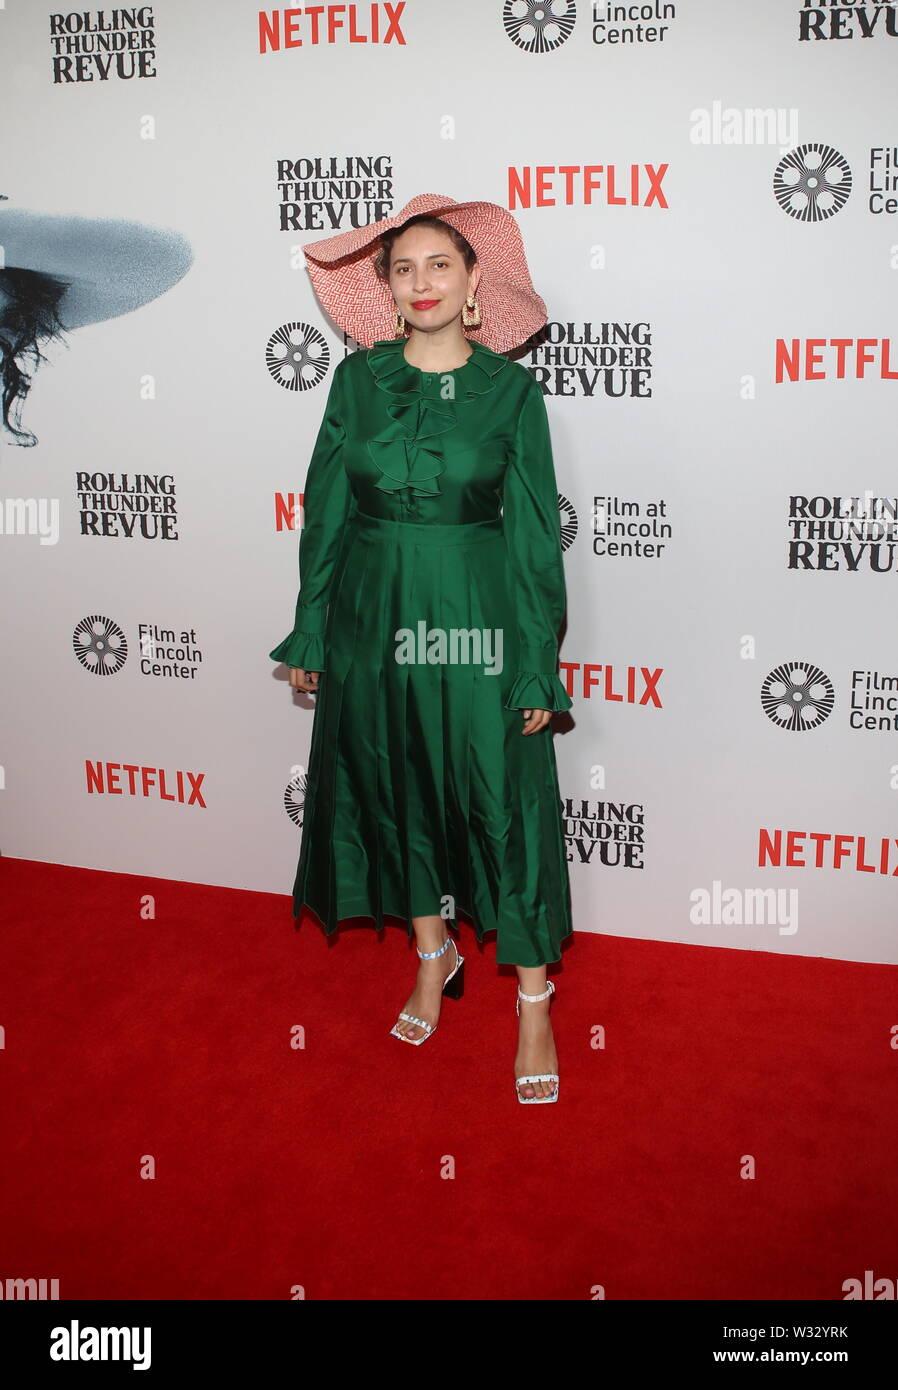 Netflix New York Special Screening of Rolling Thunder Revue